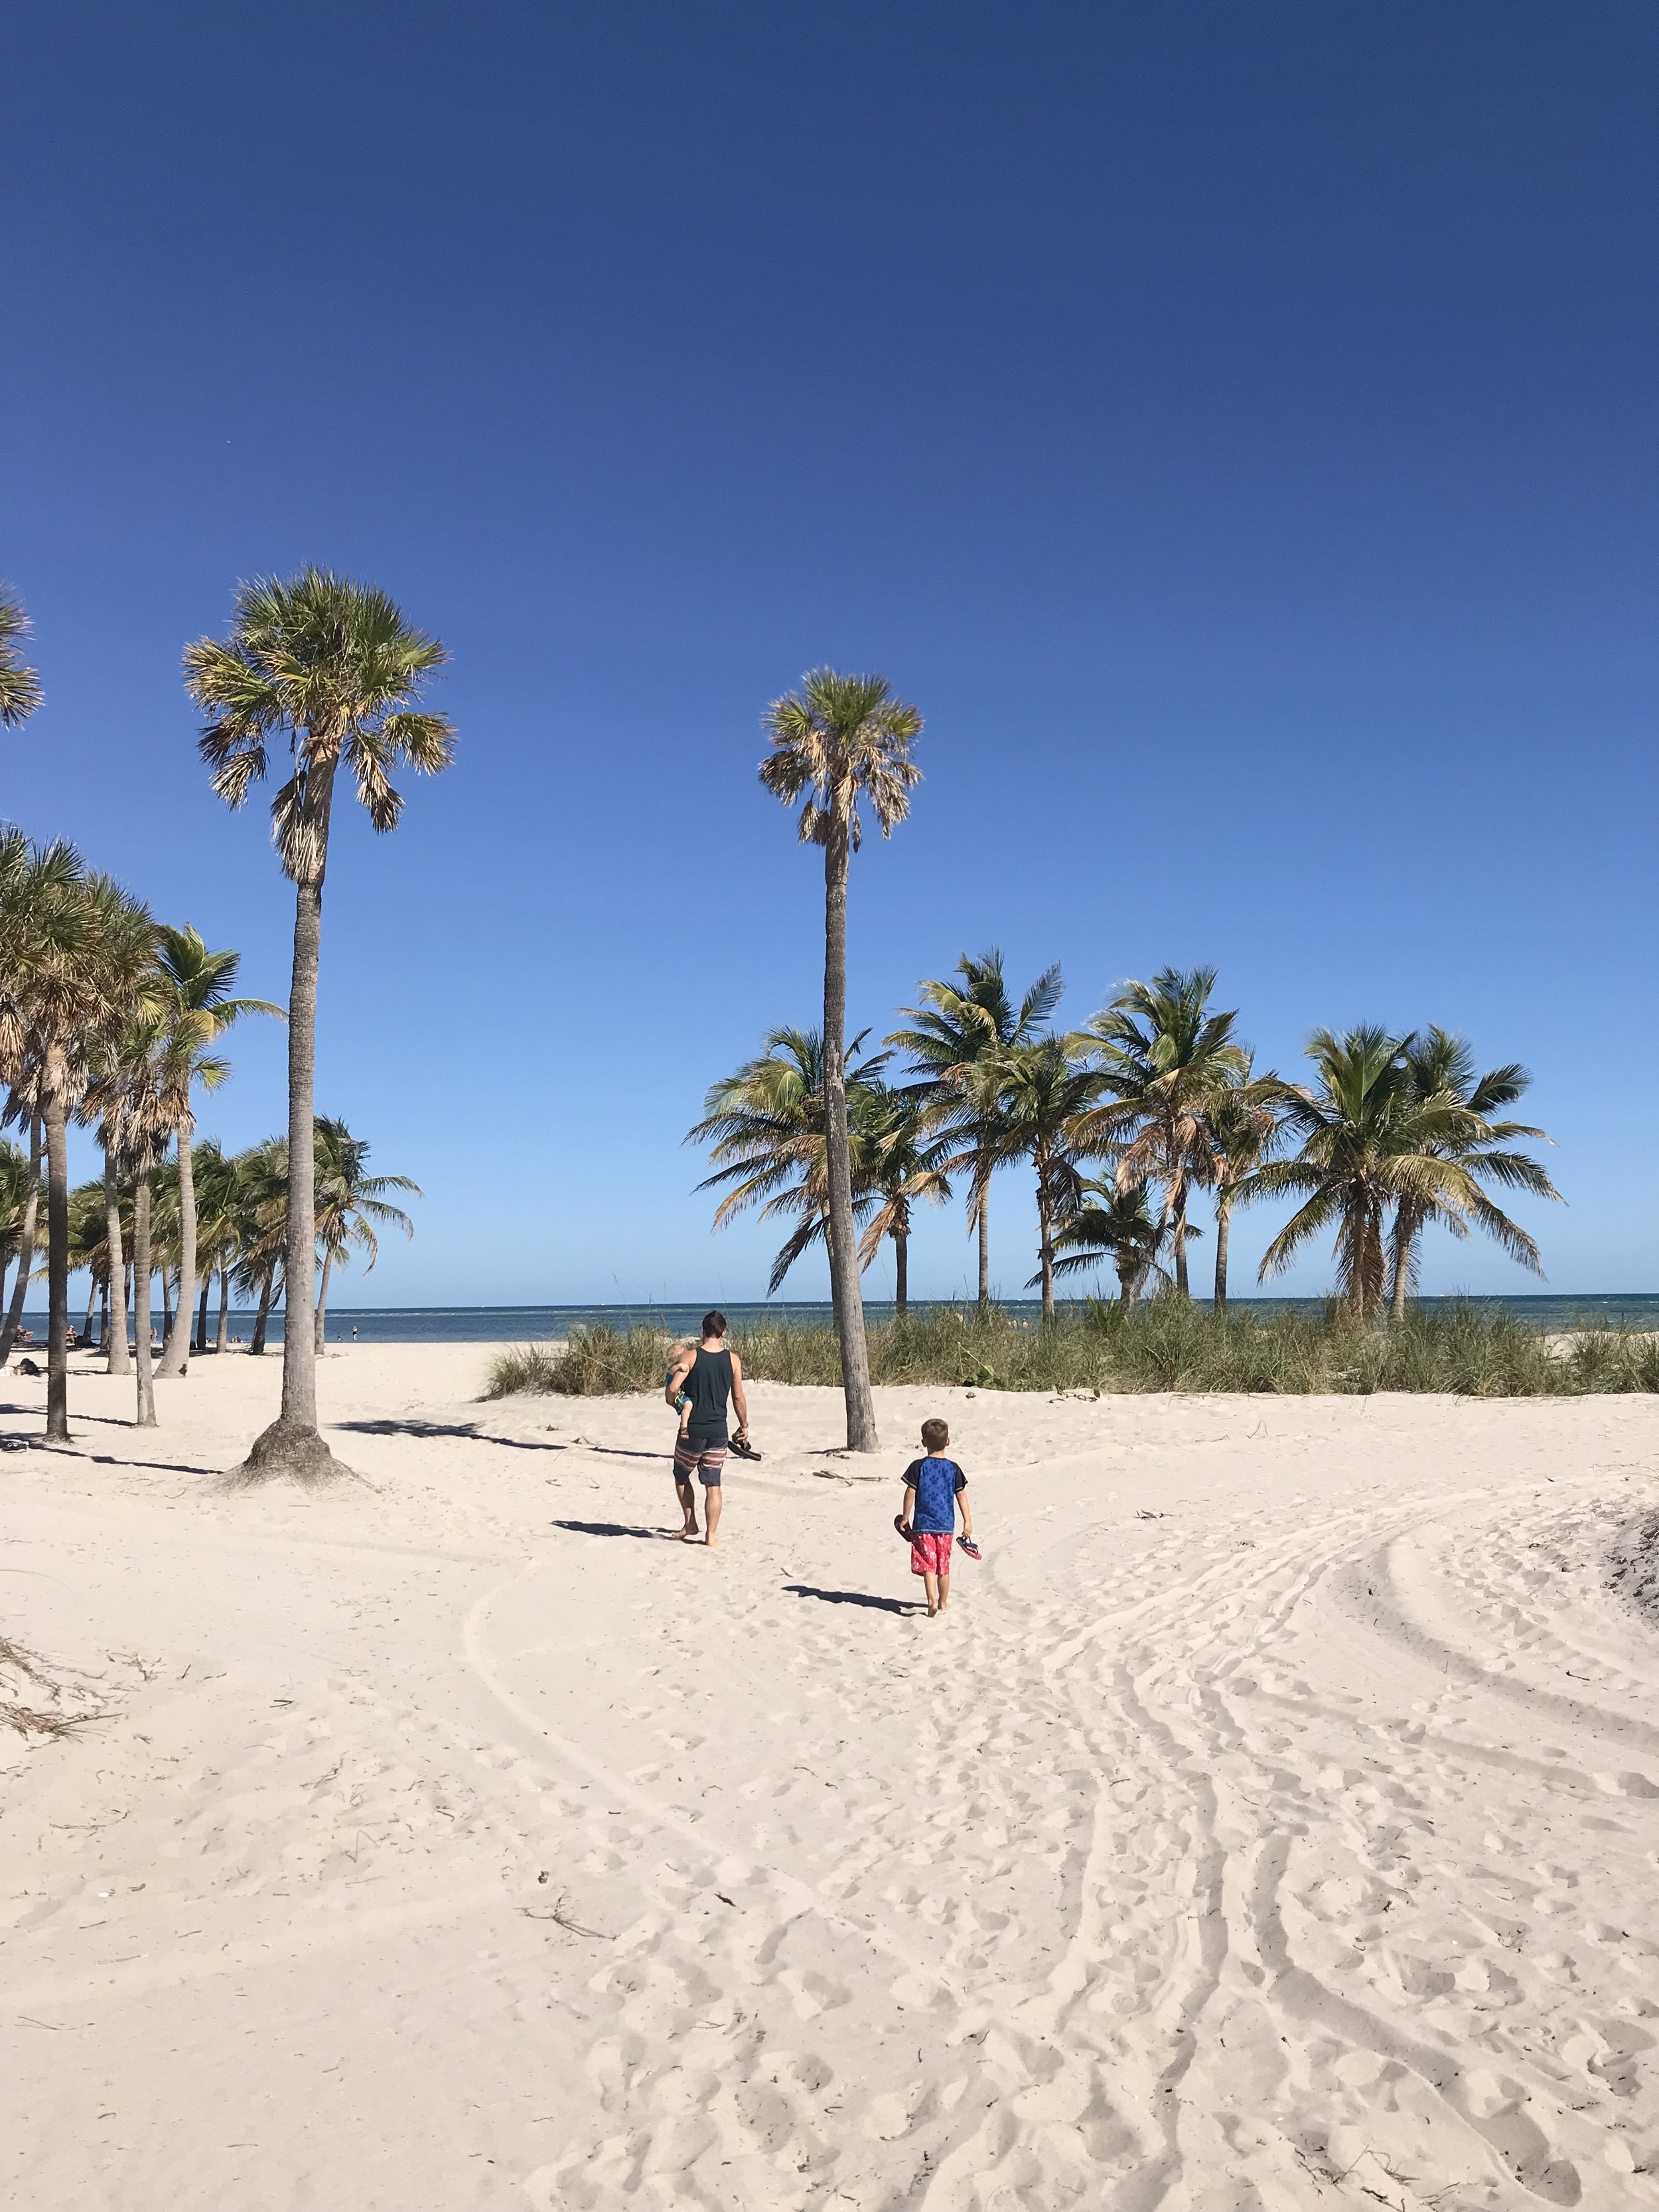 Not Michigan   Miami, FL   February